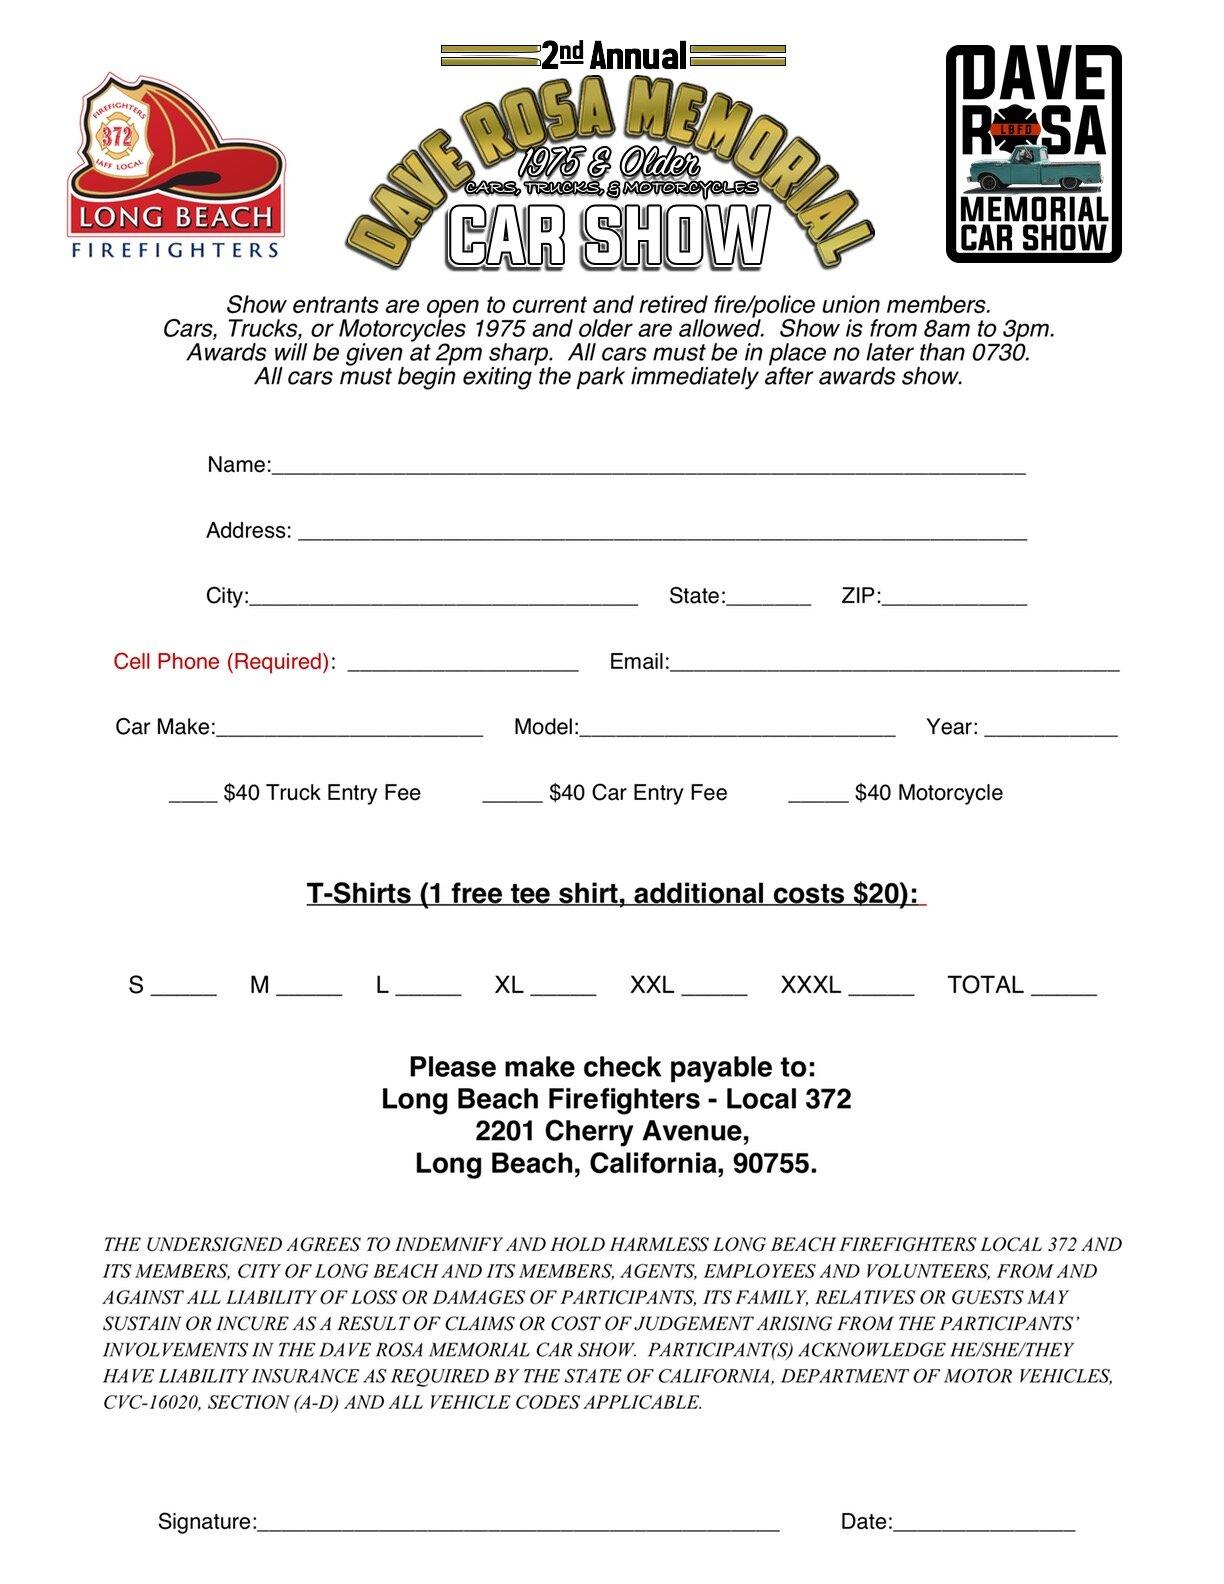 2nd Annual Registration Form.JPG